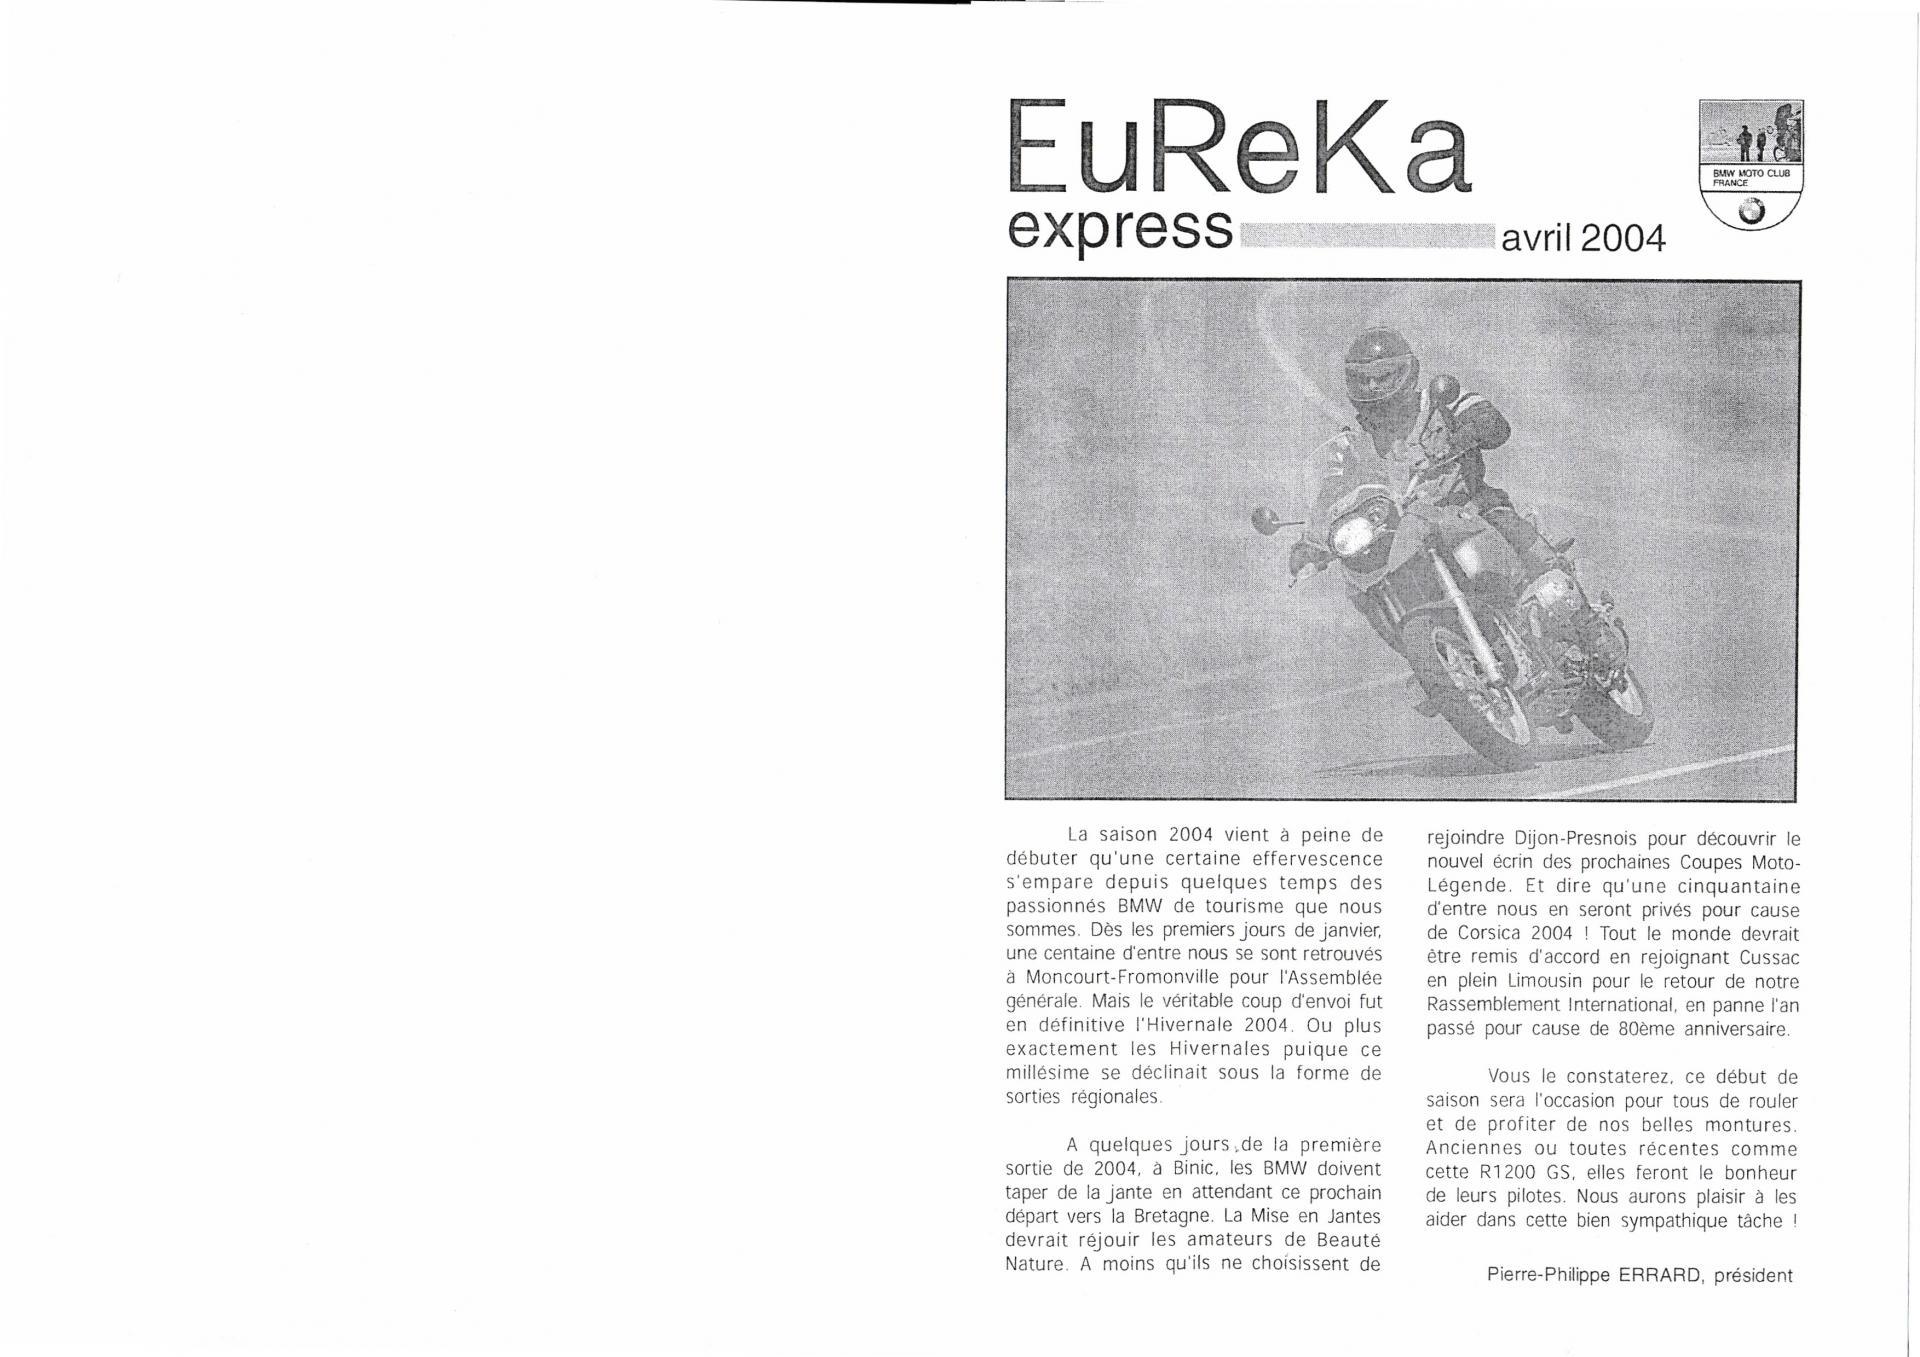 Eureka express avril 2004 1